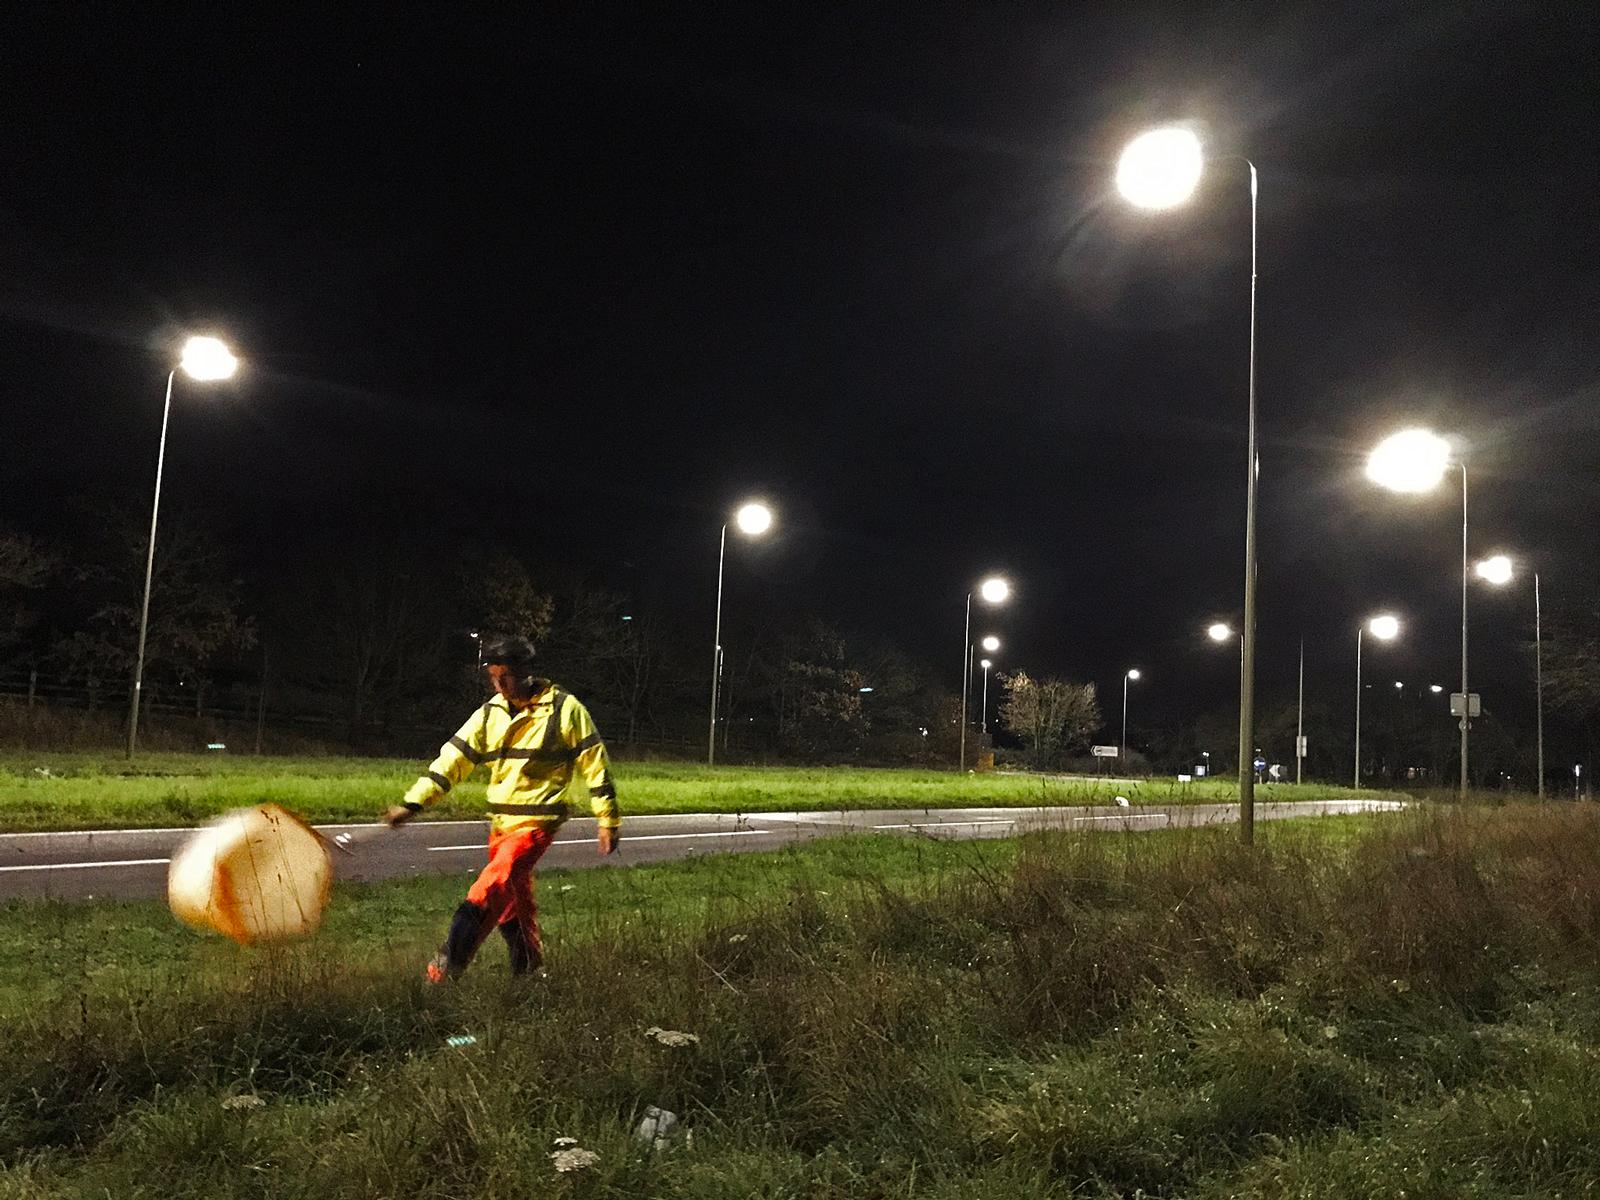 Douglas Boyles conducts nighttime field work.